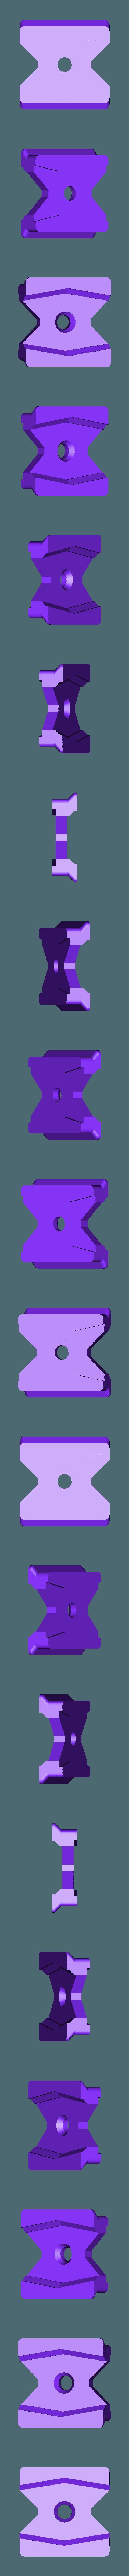 rx100m5a-bracket-arca.stl Download free STL file Sony DSC RX100VA RX100M5A Bracket Grip Extension • 3D print template, whoopsie